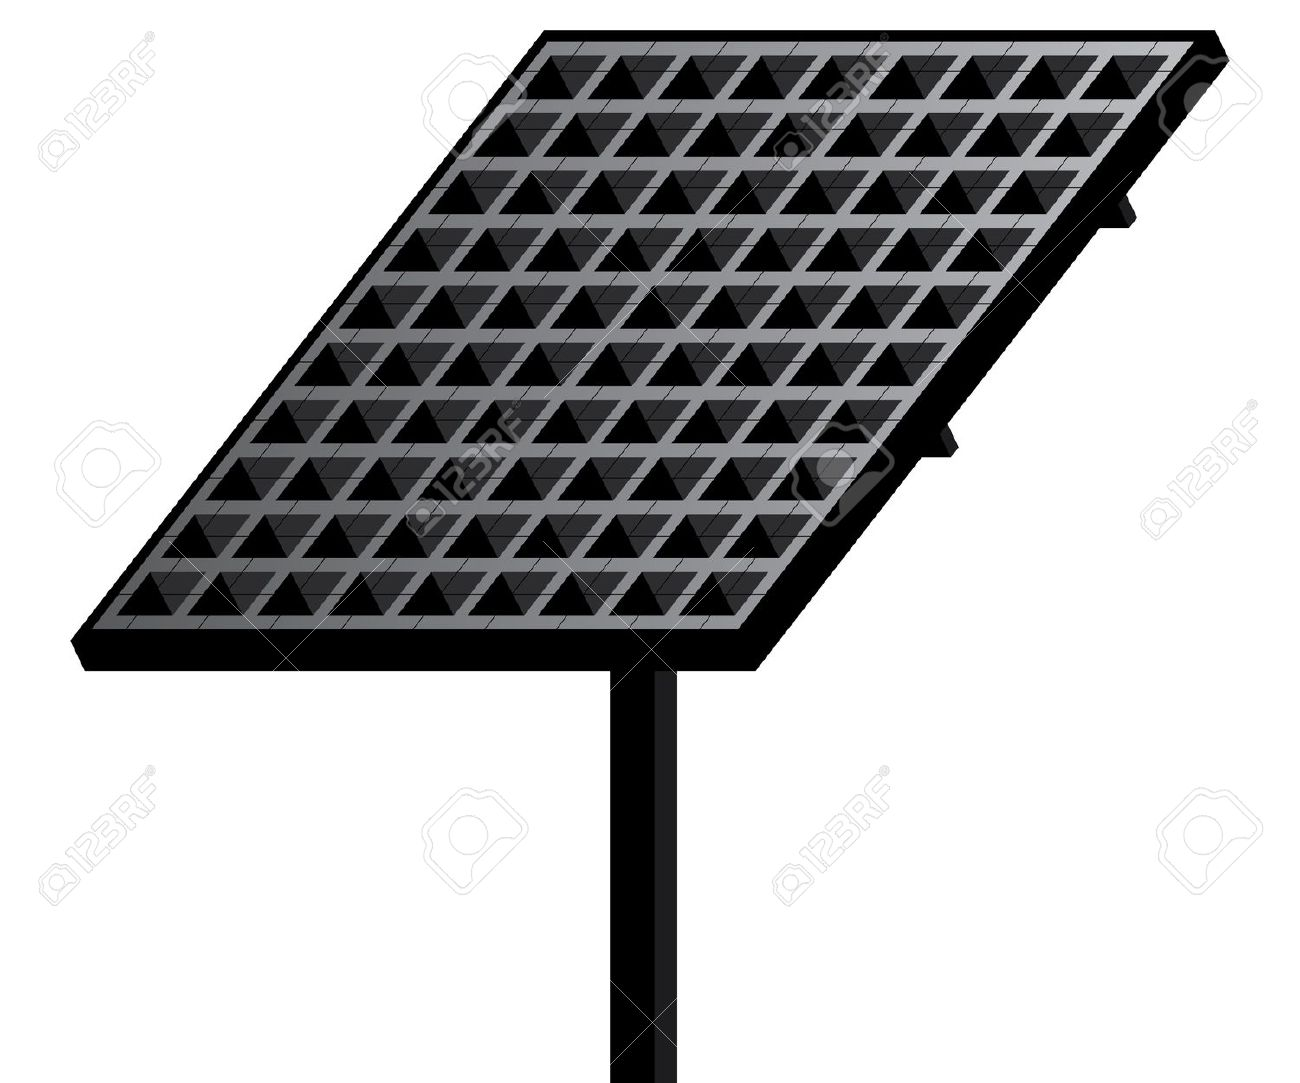 clip art solar power - photo #42